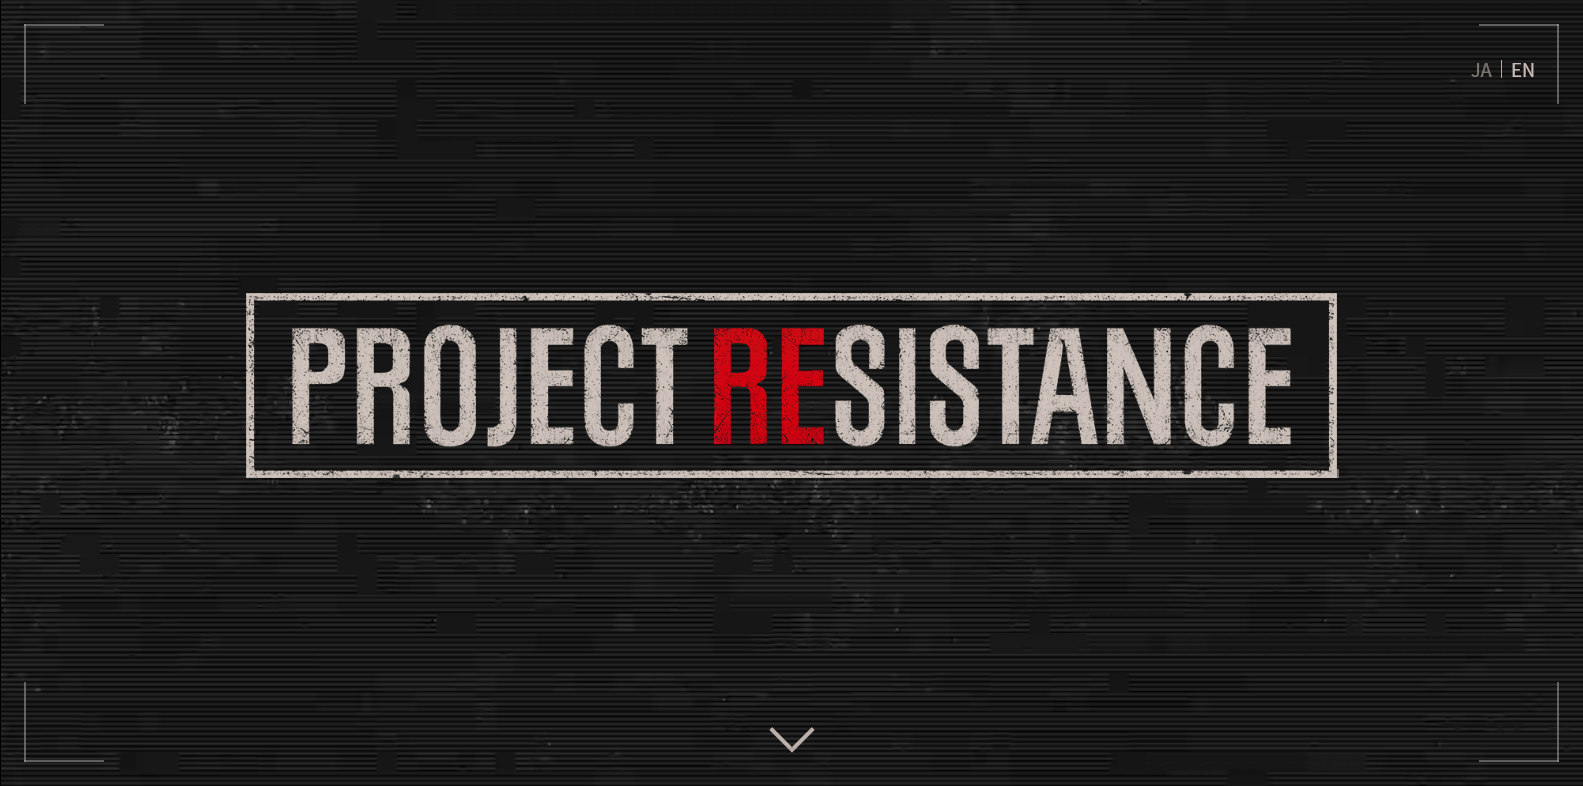 Project Resistance Site